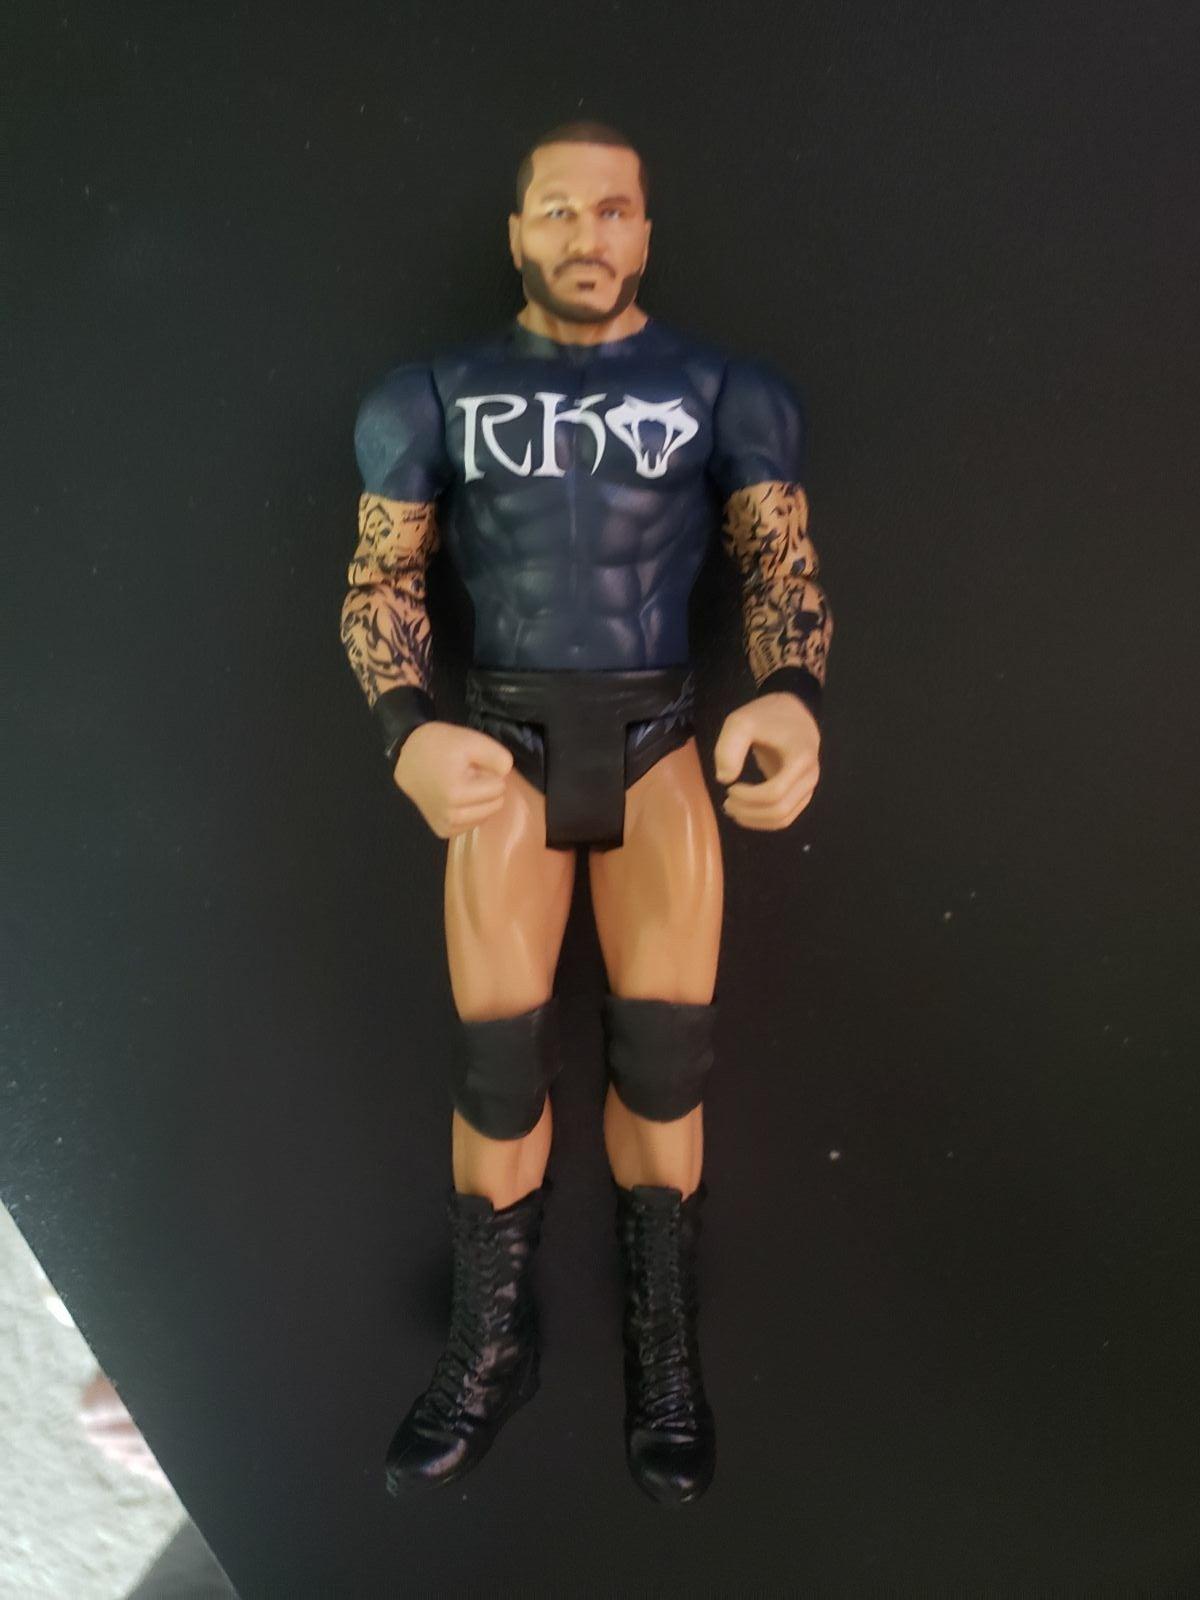 Randy Orton rKo Fan Central Basic WWE